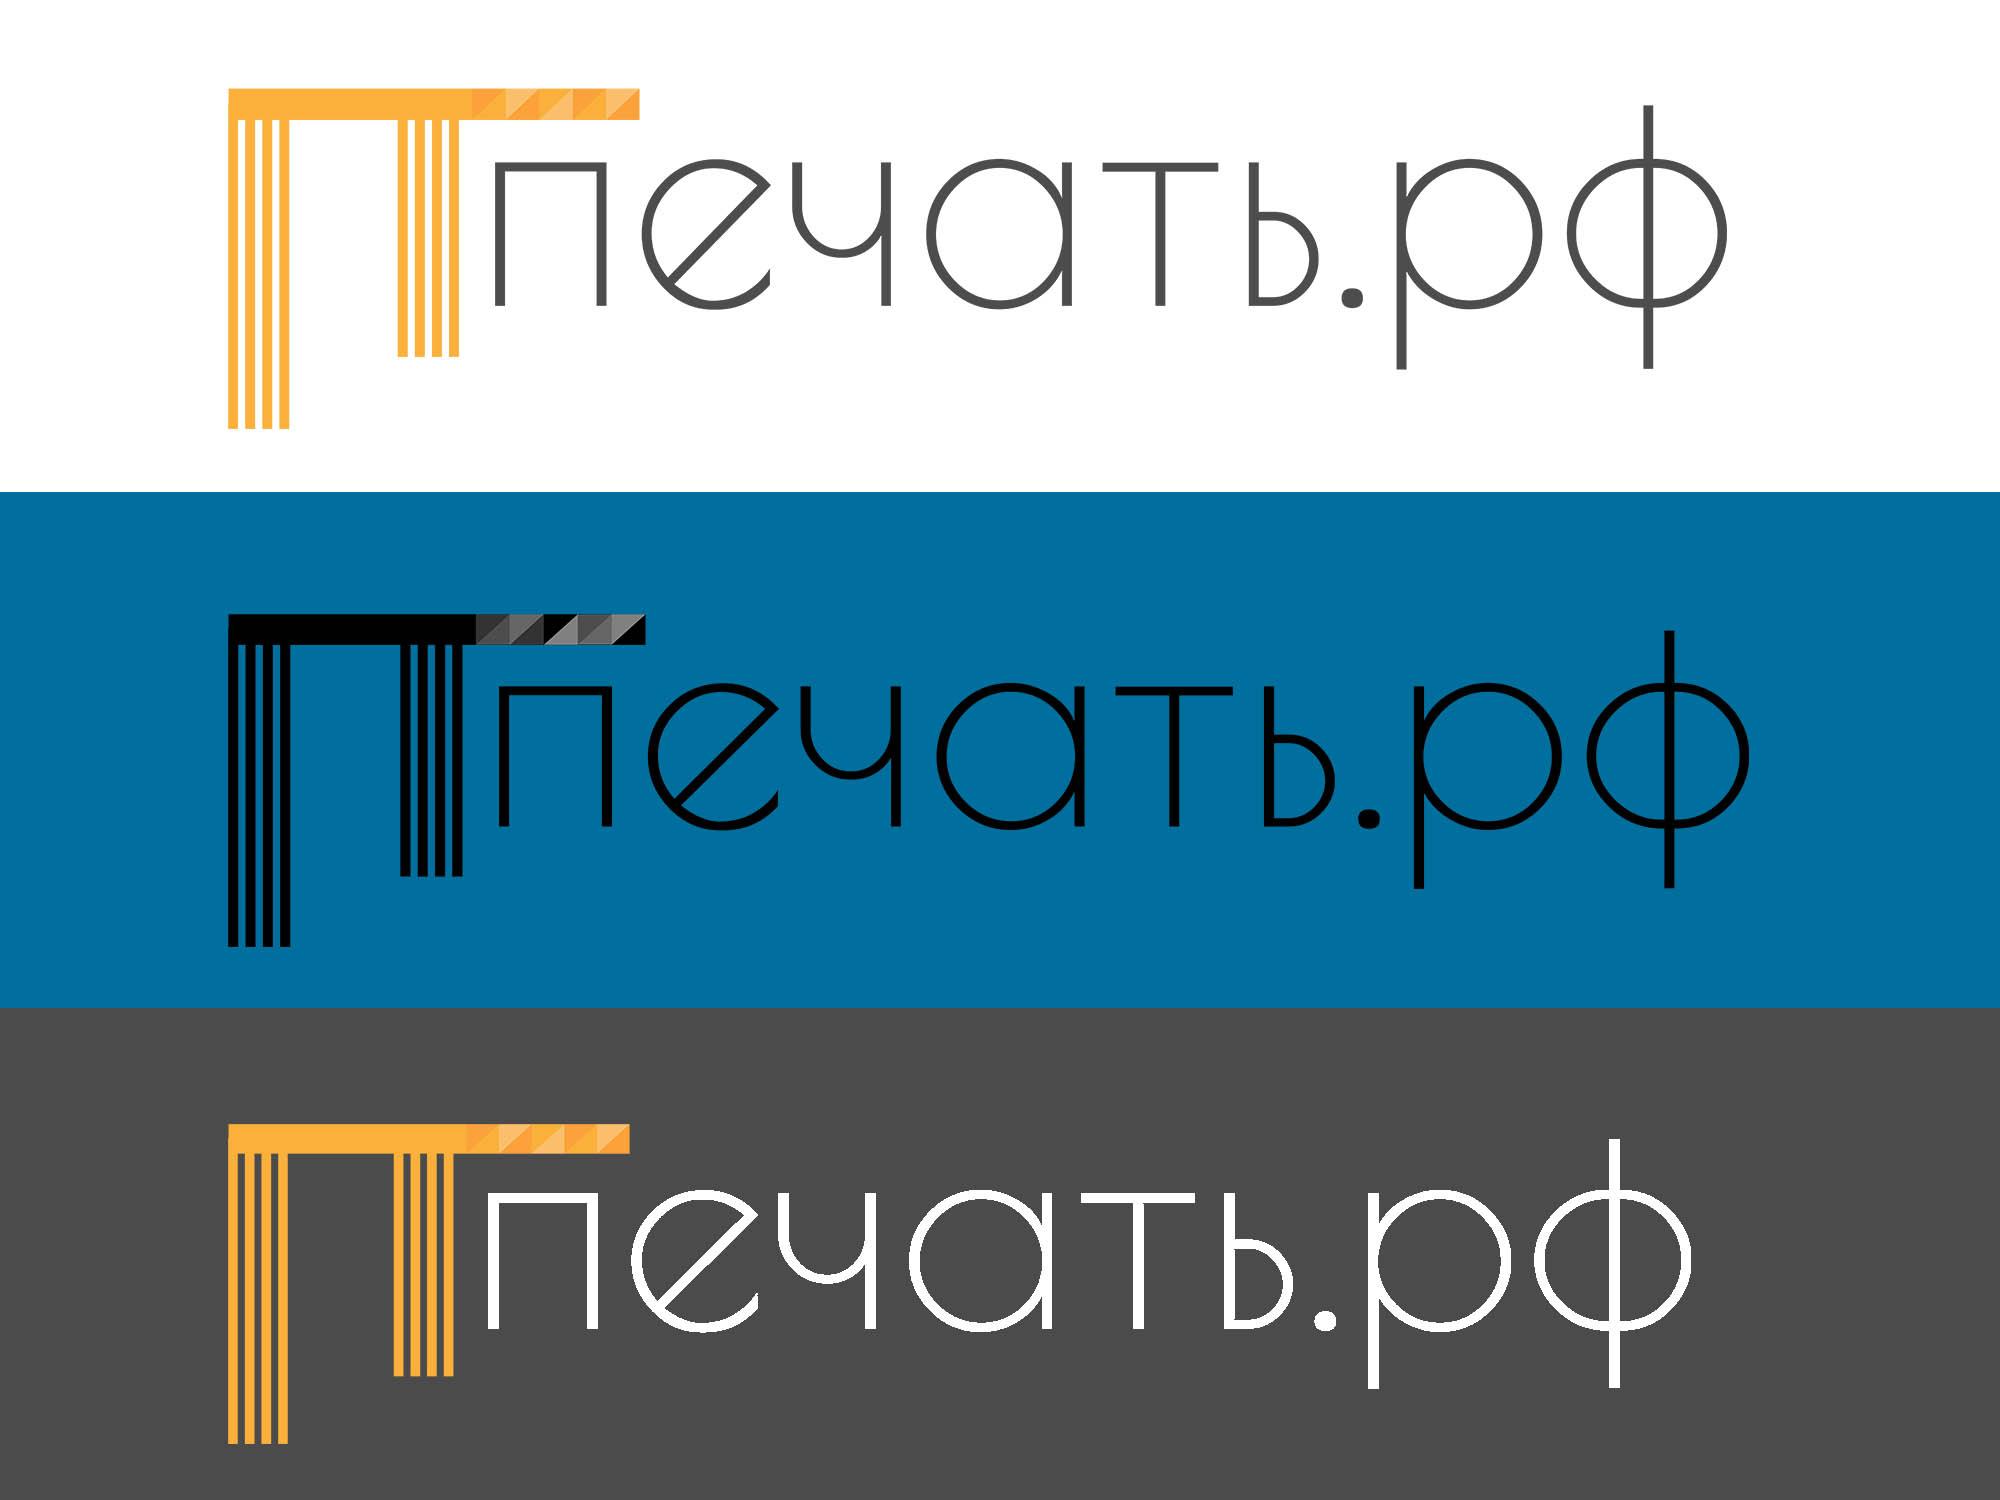 Логотип для веб-сервиса интерьерной печати и оперативной пол фото f_0655d28688184a5d.jpg